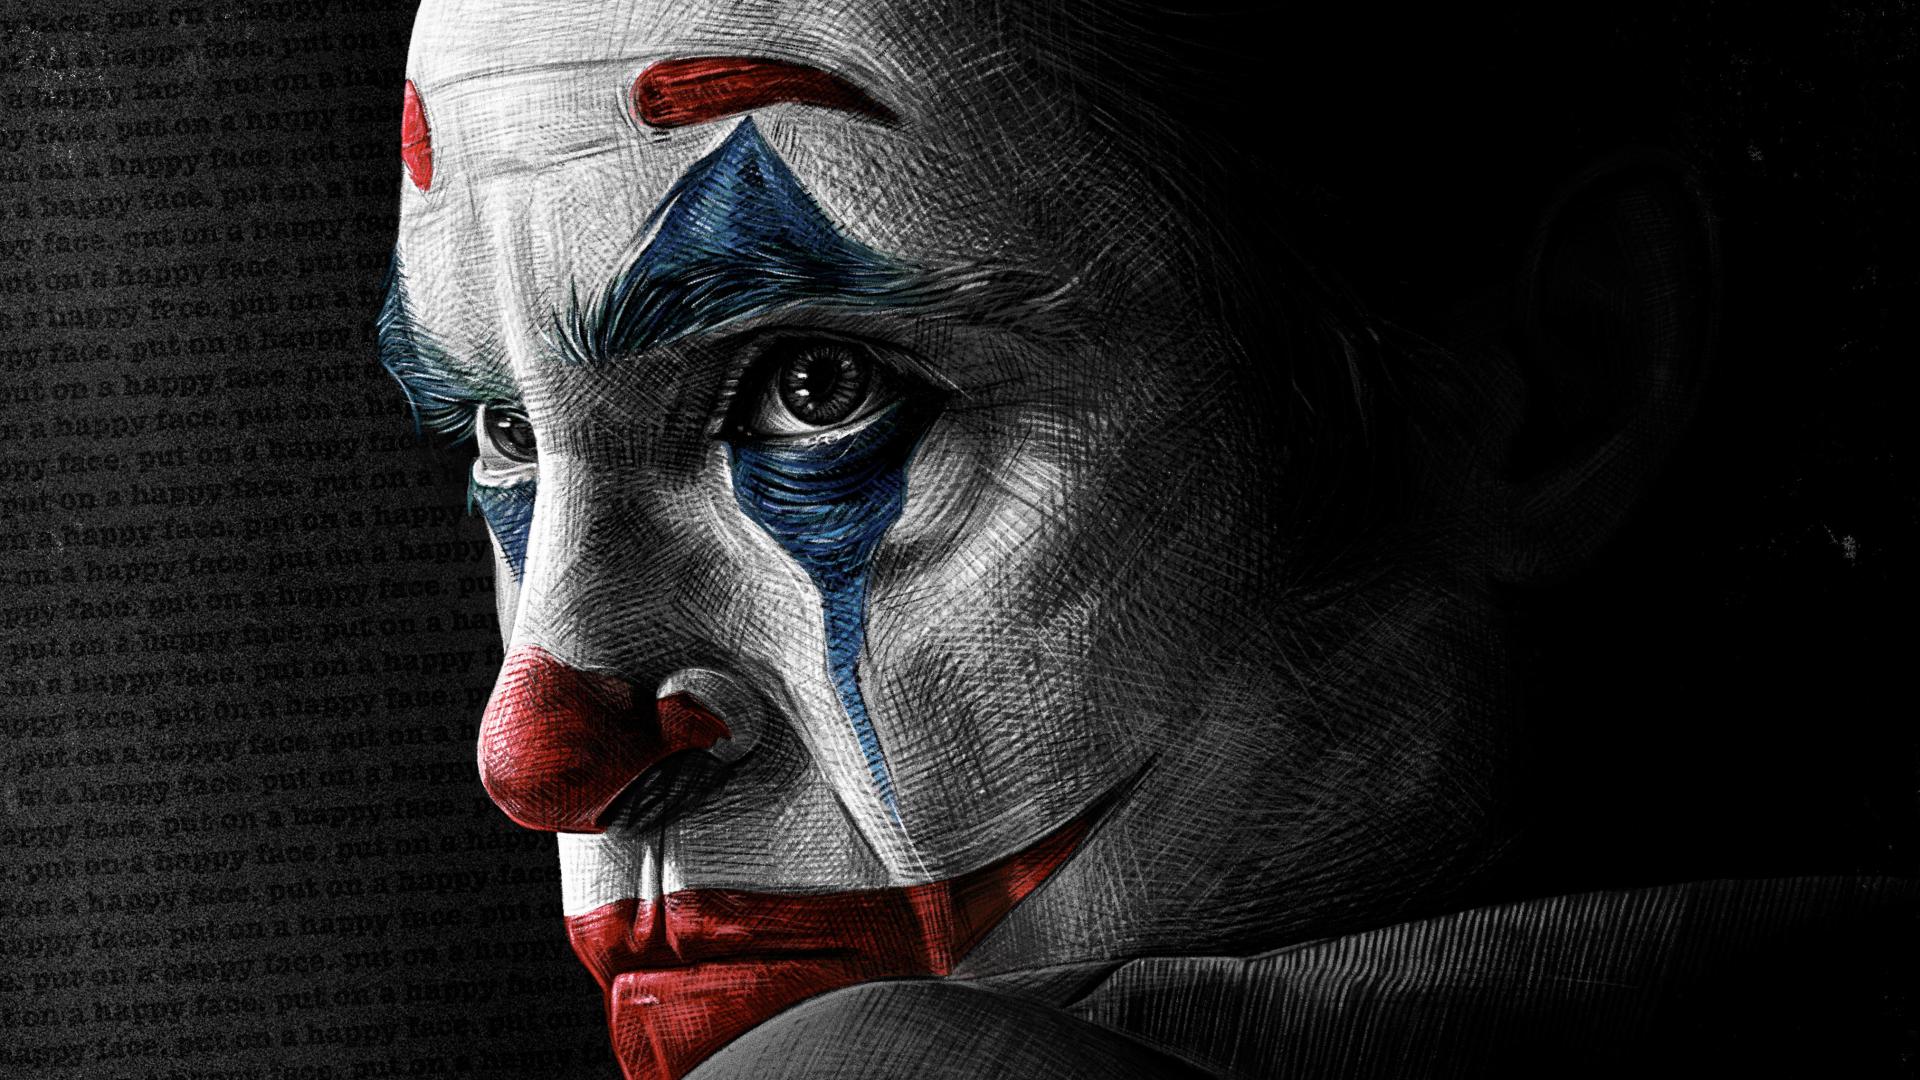 1920x1080 4k Joaquin Phoenix As Joker 1080p Laptop Full Hd